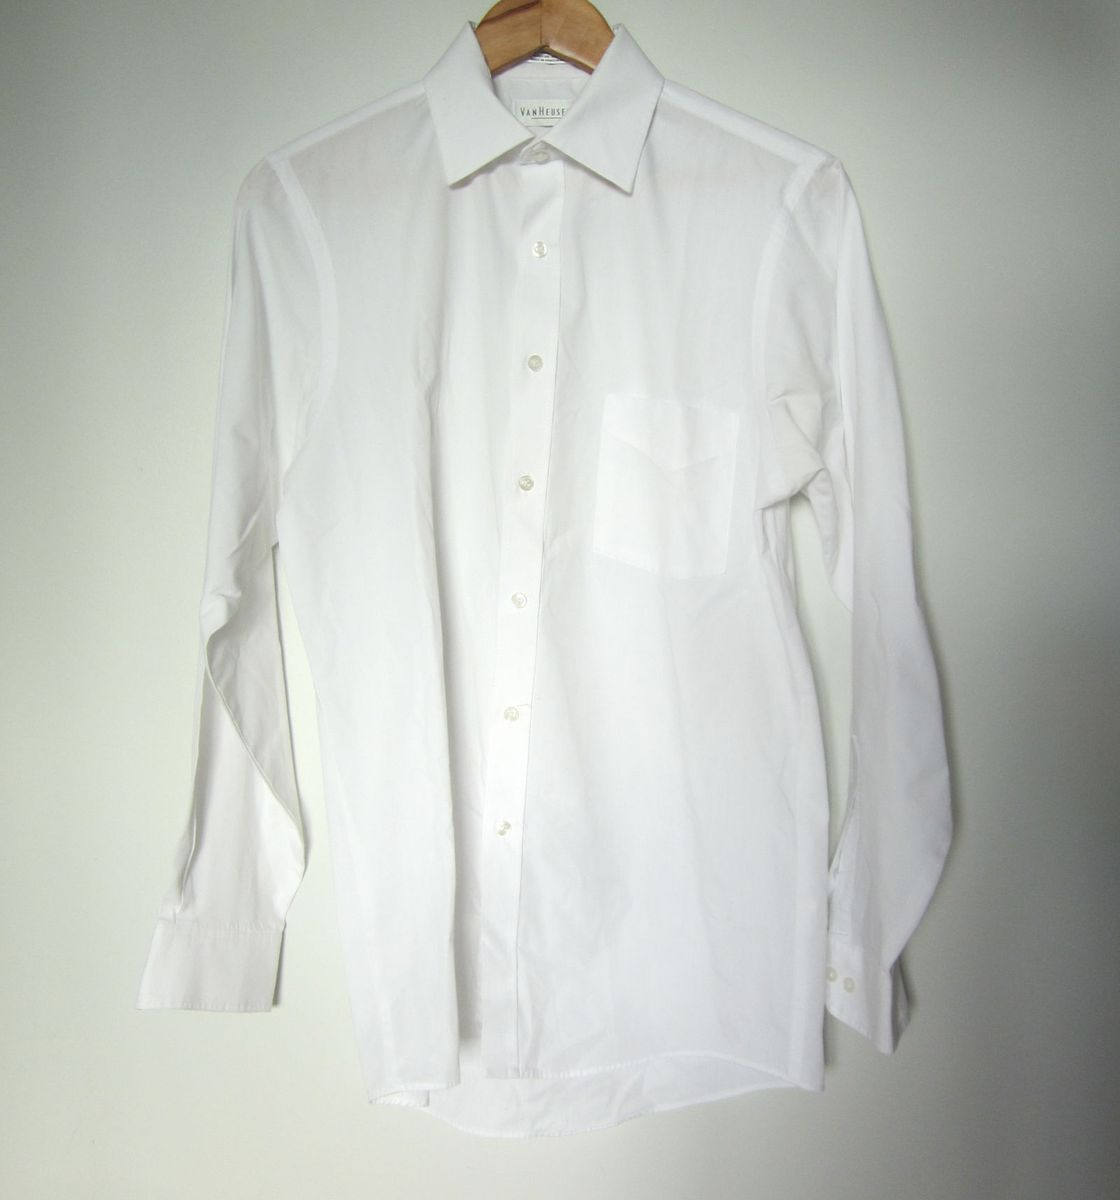 c09e9eab2 camisa branca manga comprida social - camisas van heusen